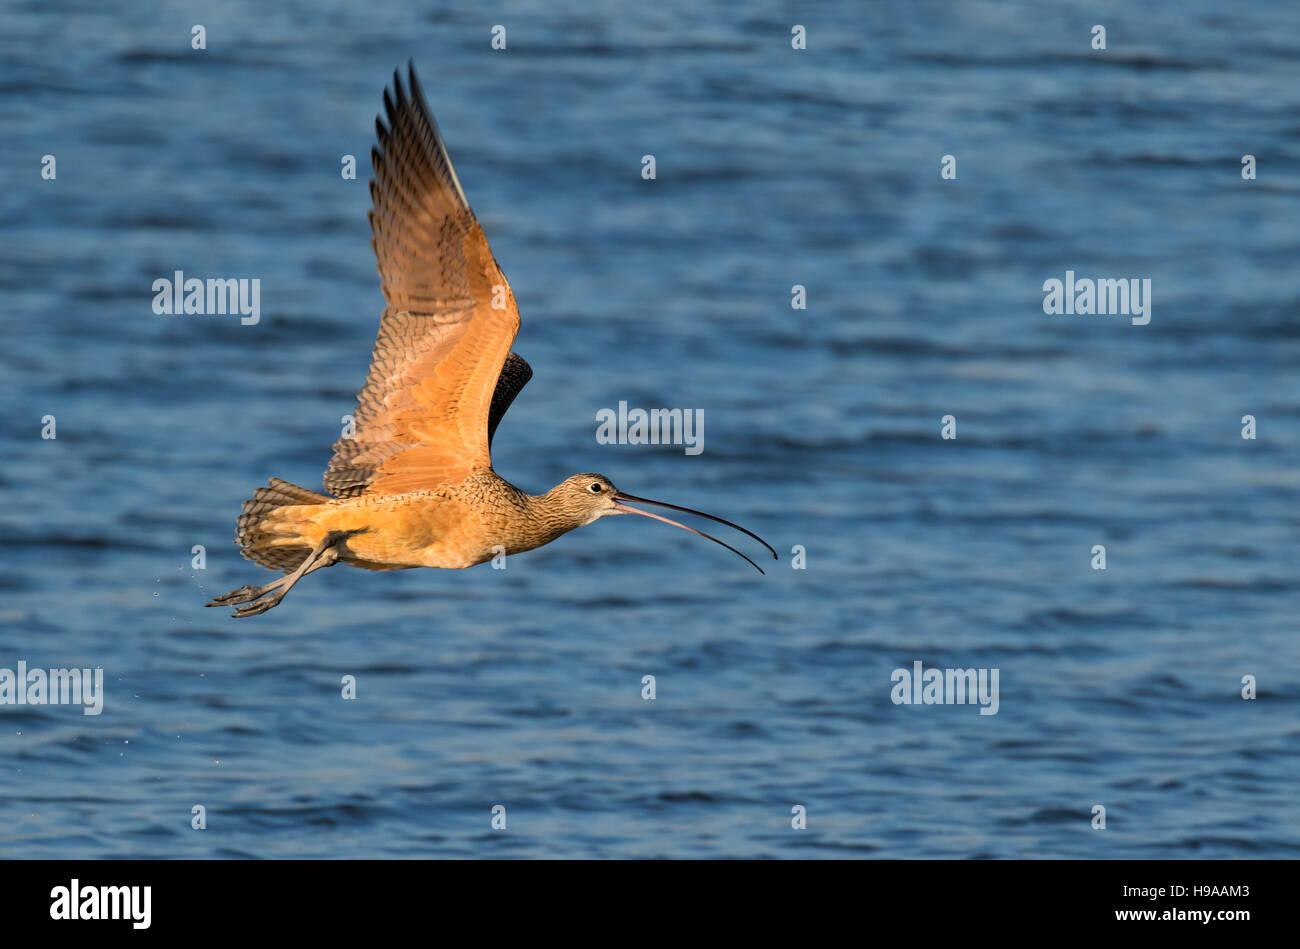 Long-billed curlew (Numenius americanus) flying over the ocean, Galveston, Texas, USA - Stock Image